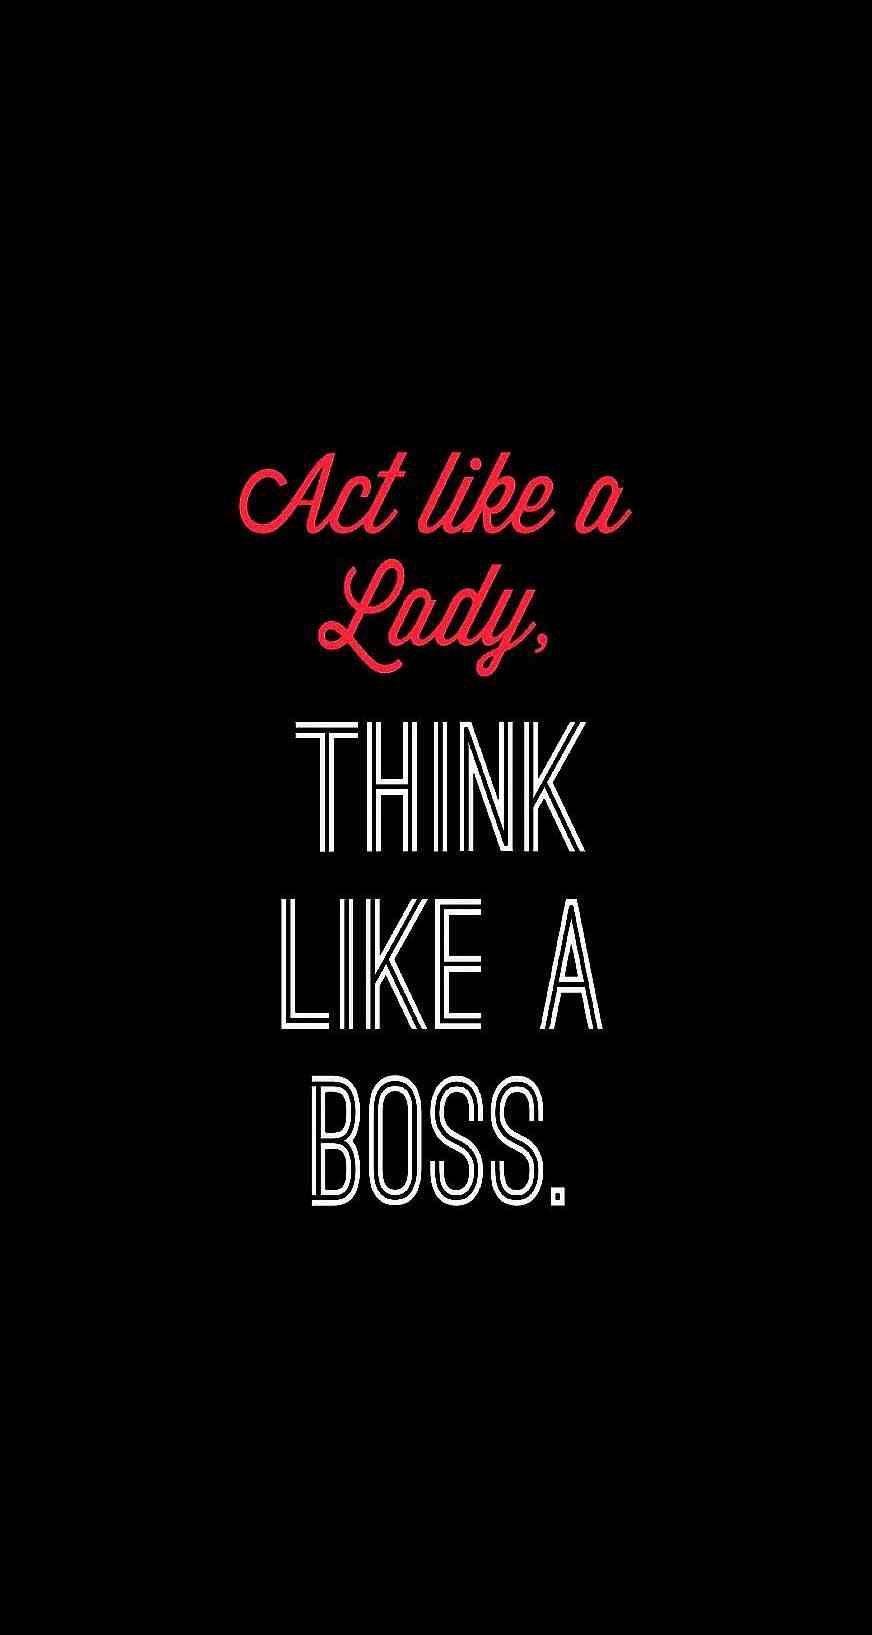 Dark quotes tumblr iphone wallpaper - Este Wallpaper Nos Hizo El D A Act Like A Lady Think Like A Boss